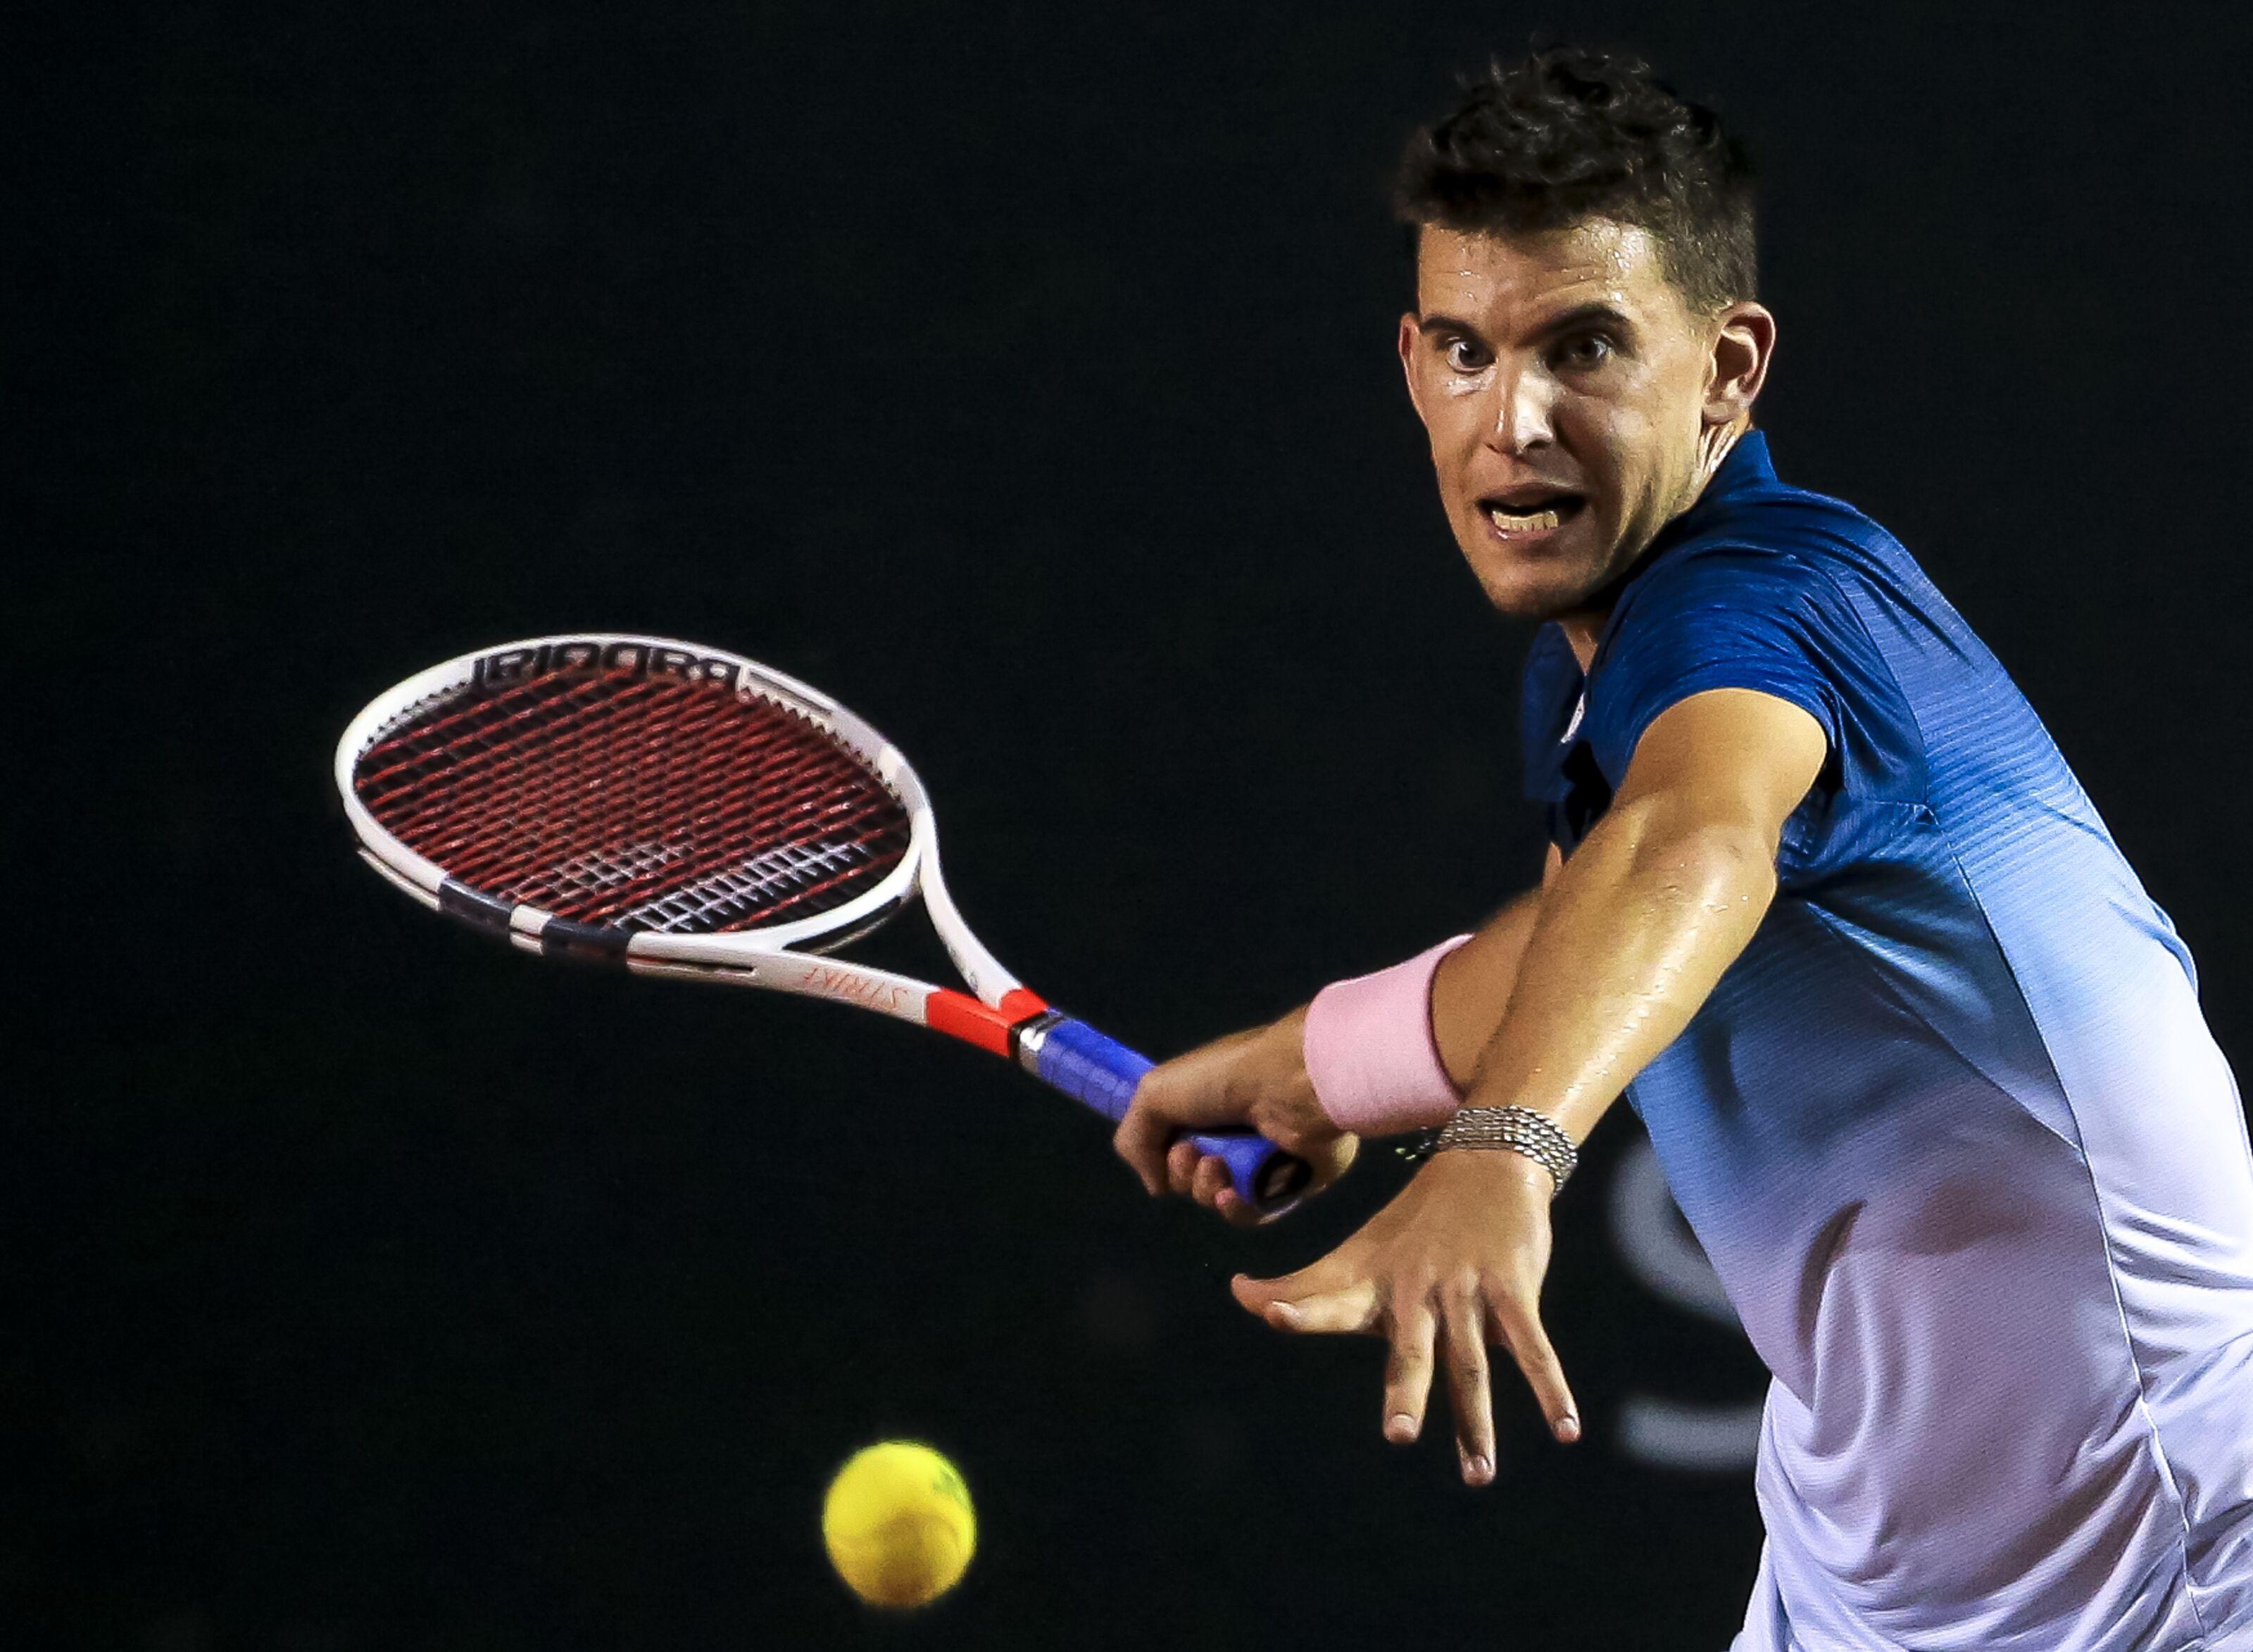 Dominic Thiem troubles at Rio Open reveal concerns for 2019 ATP Tour